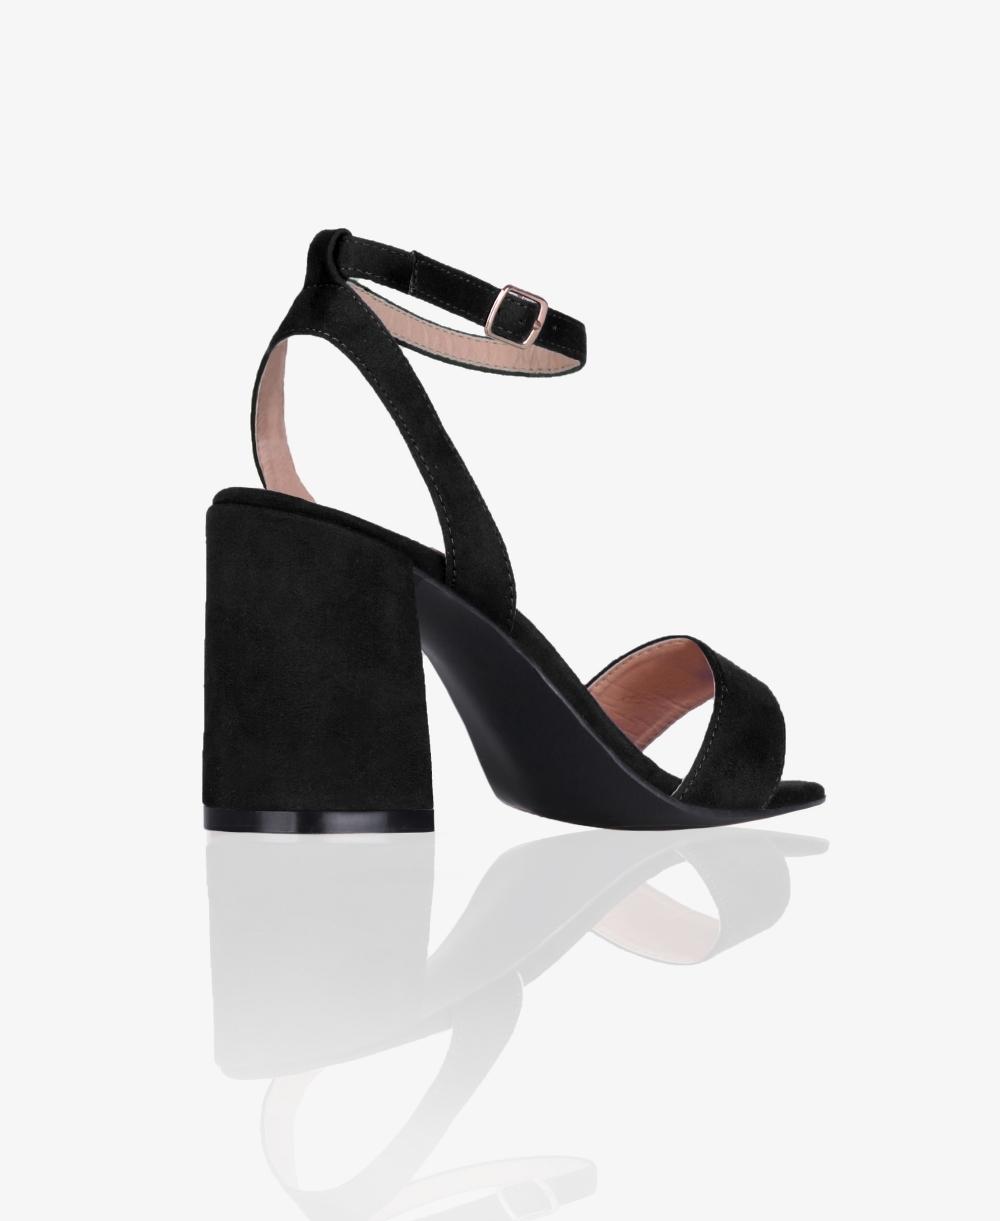 0ec967c3ac3 Satin Wrap Block Heel Sandals